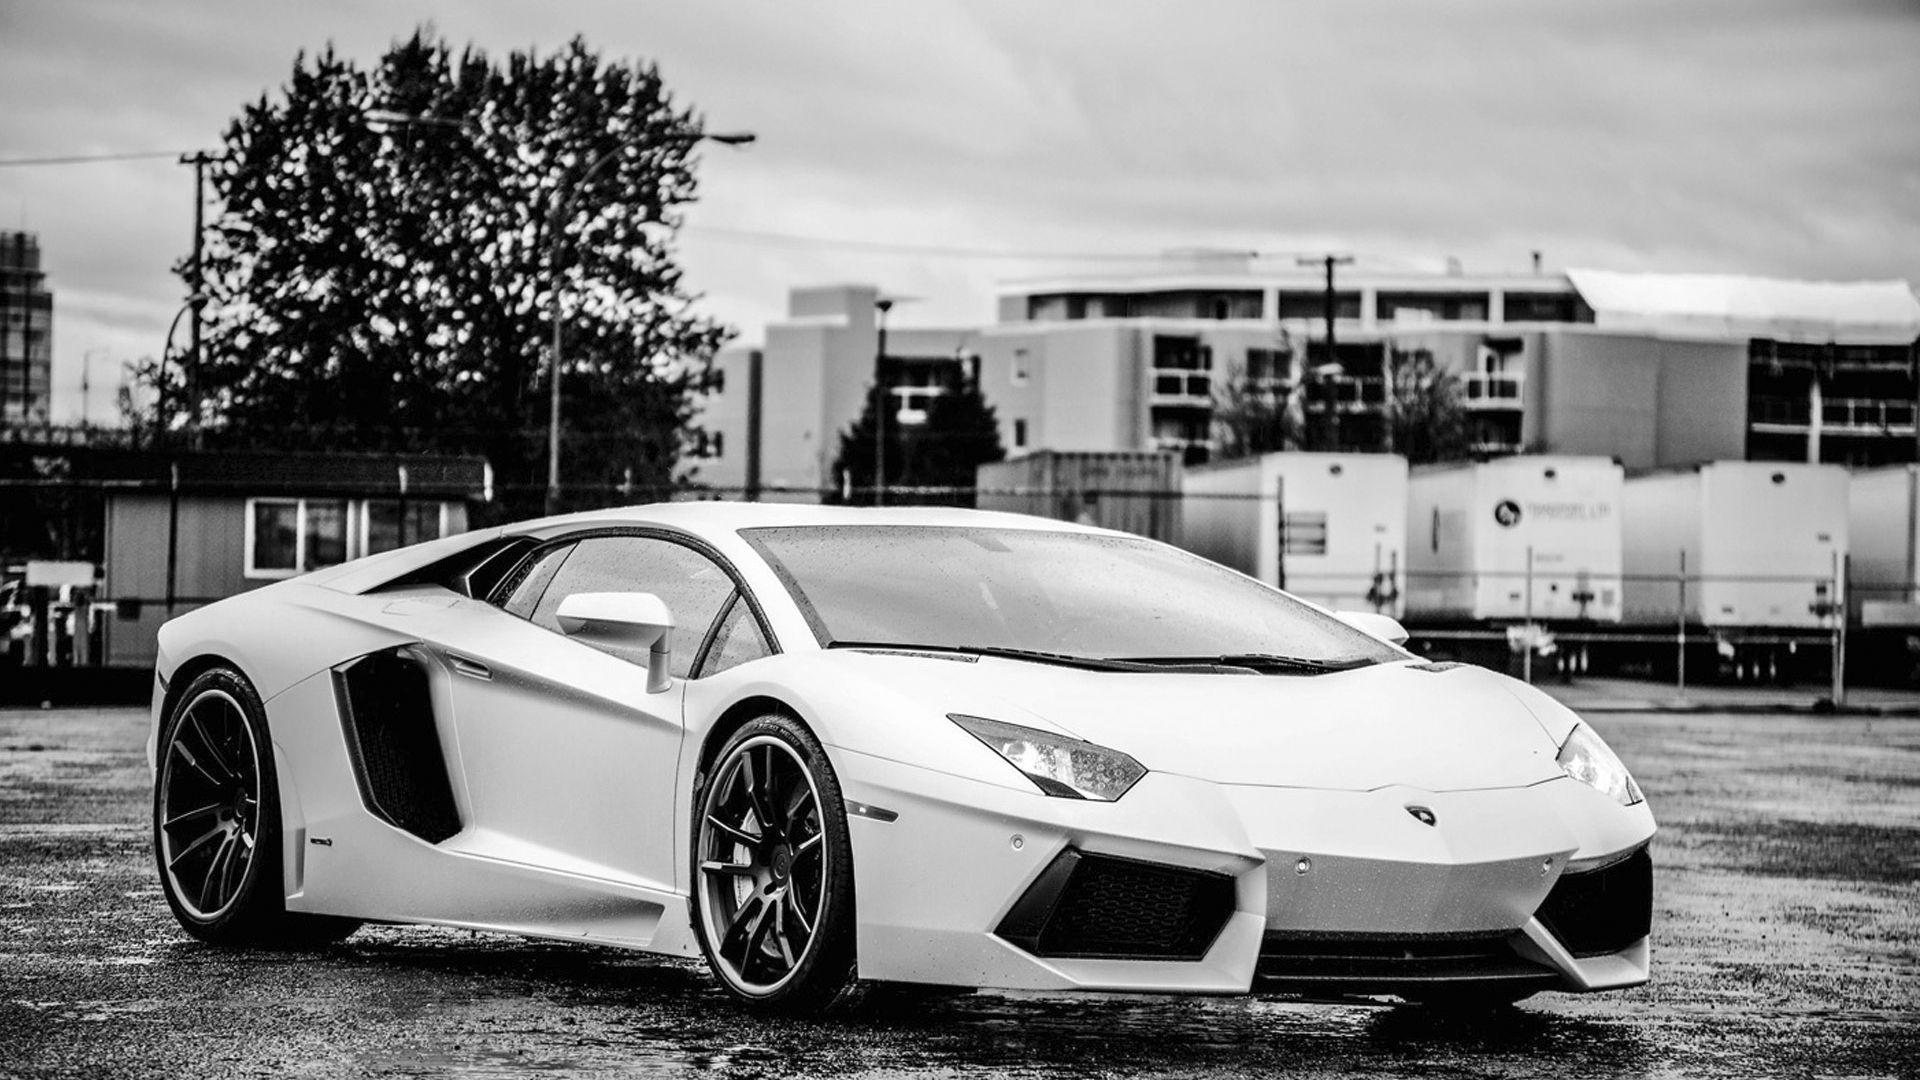 Lamborghini Aventador Wallpapers - Wallpaper Cave